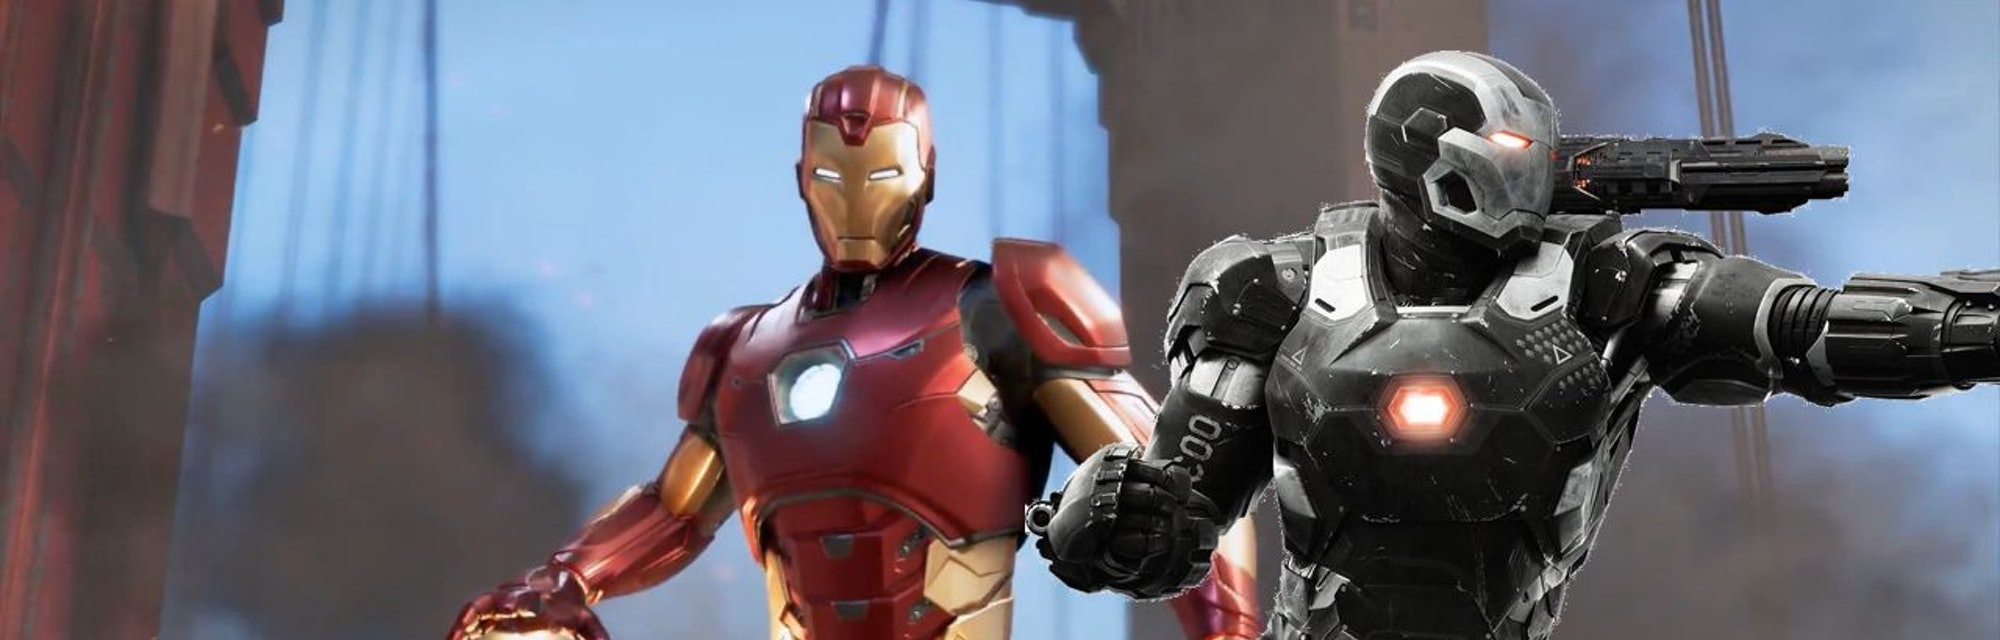 marvel's avengers game iron man war machine mcu